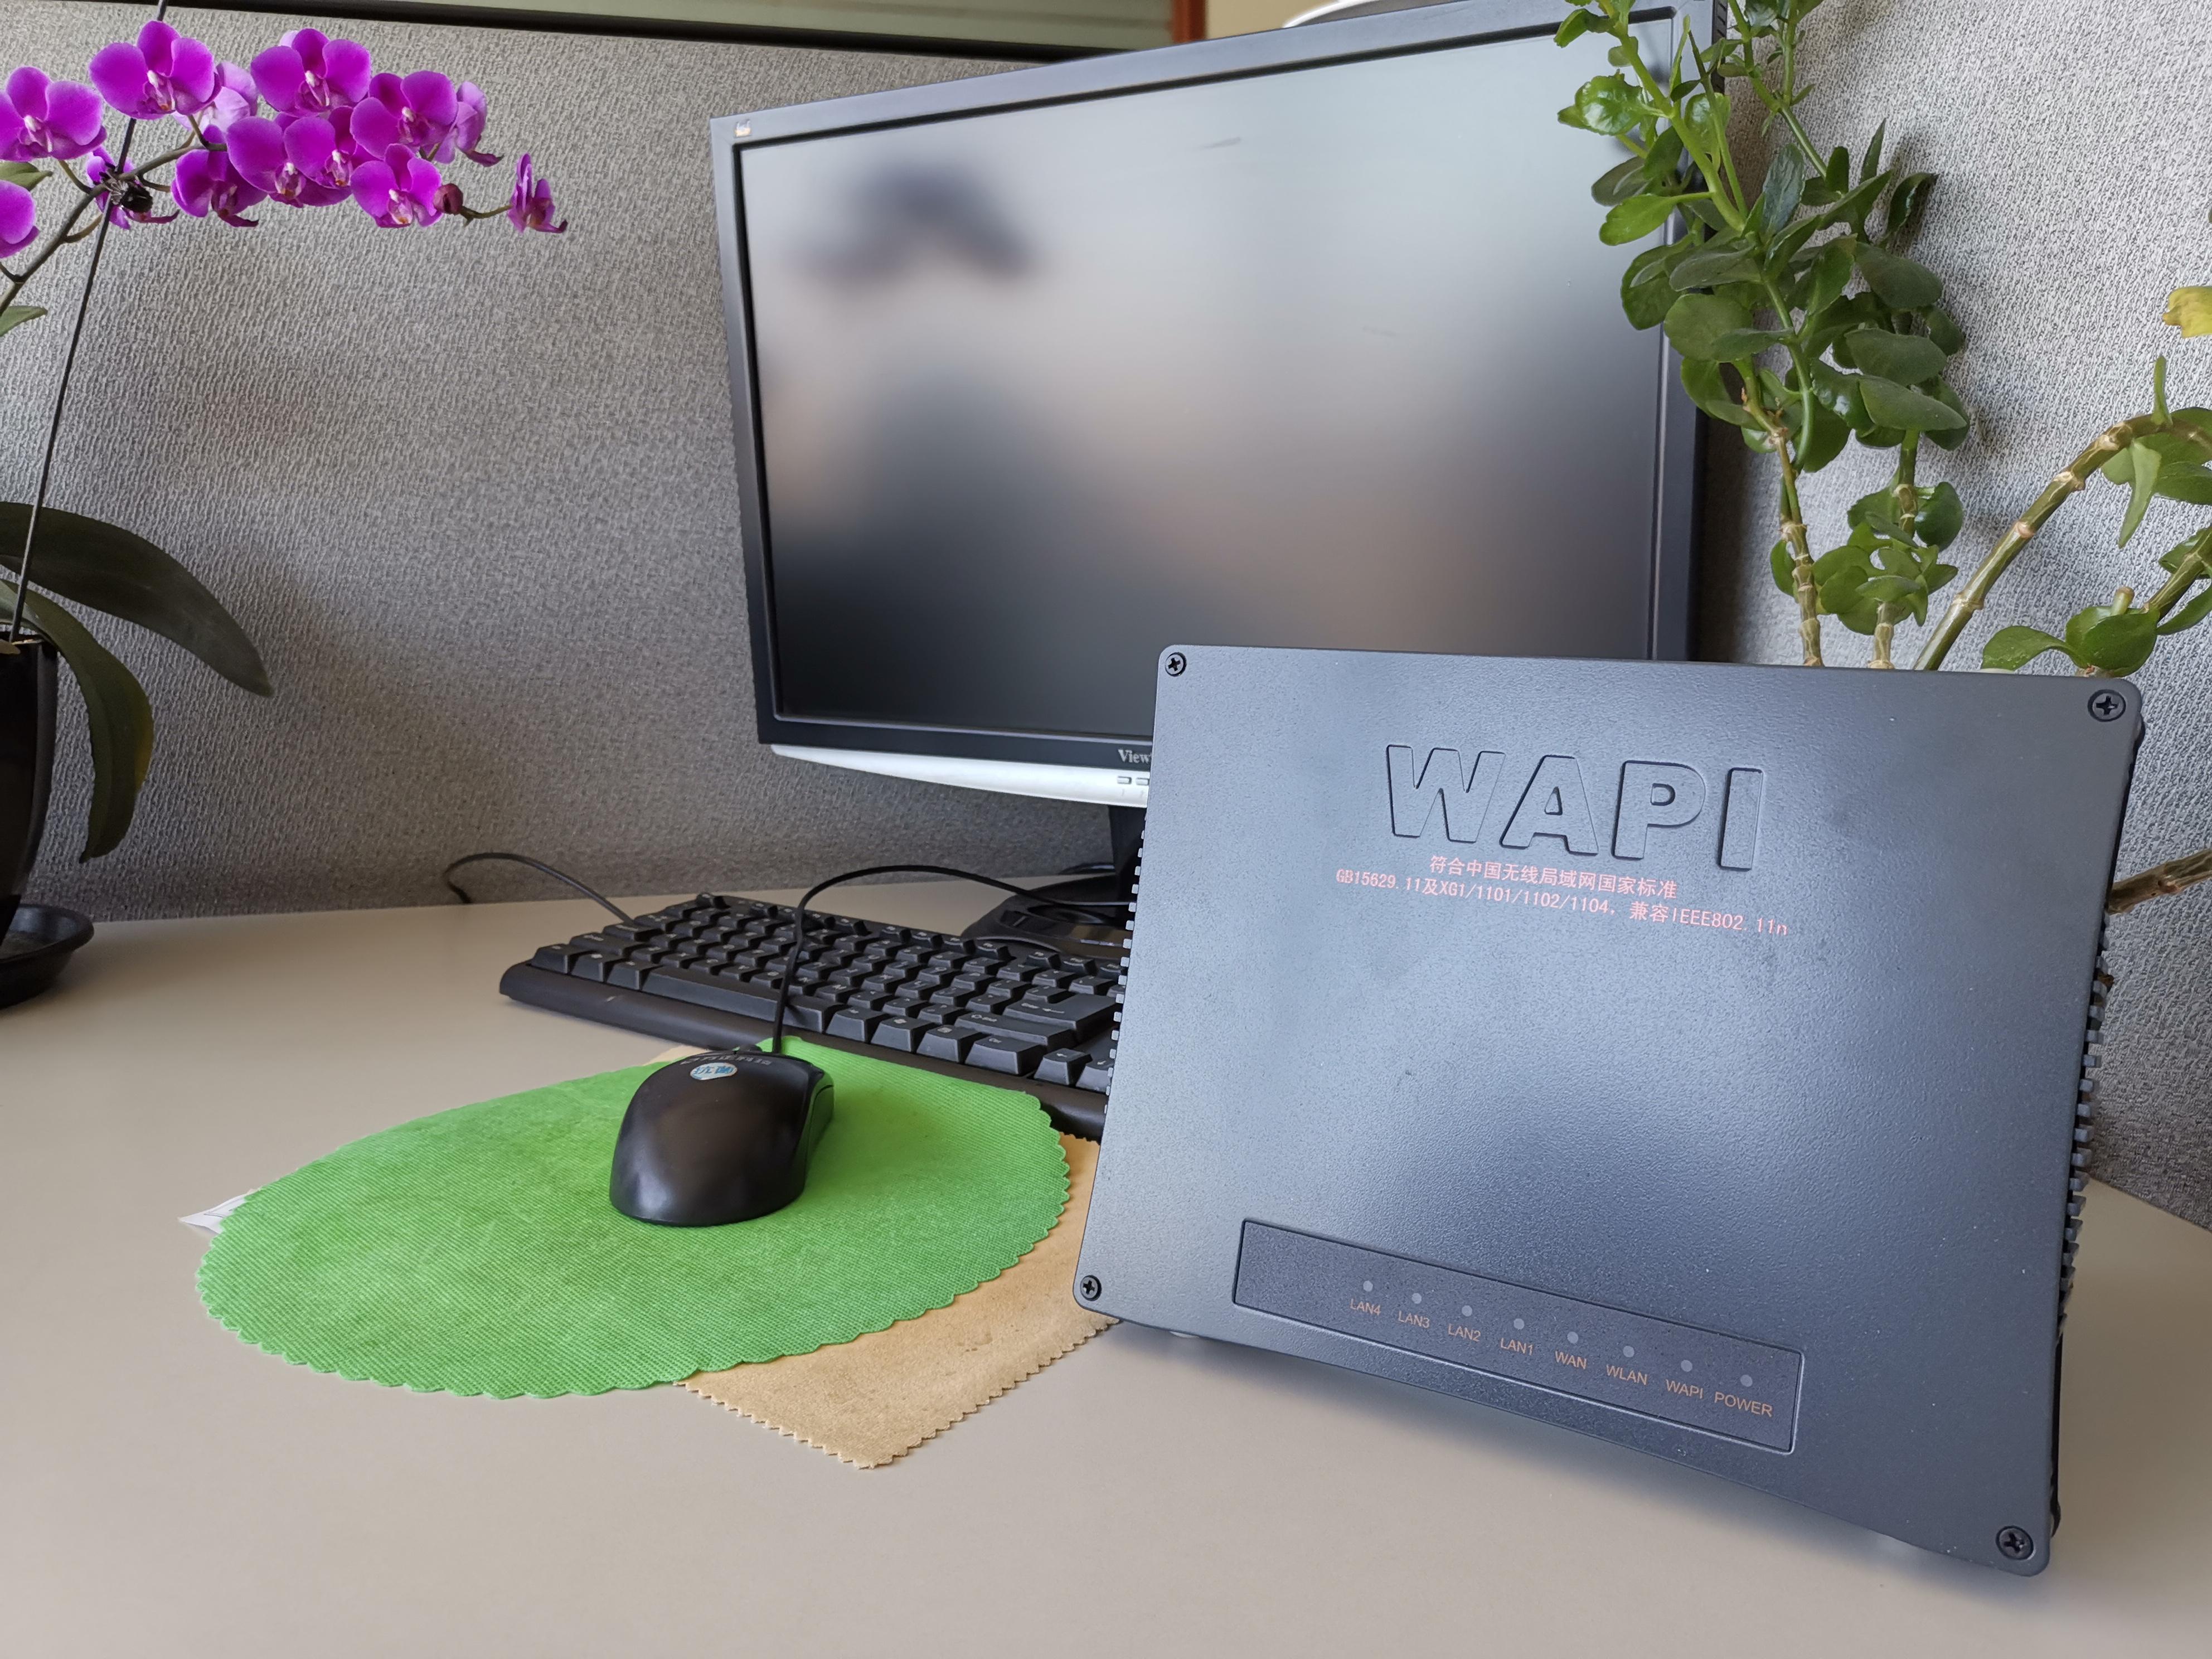 wapi是什么东西(wapi打开好还是不打开)